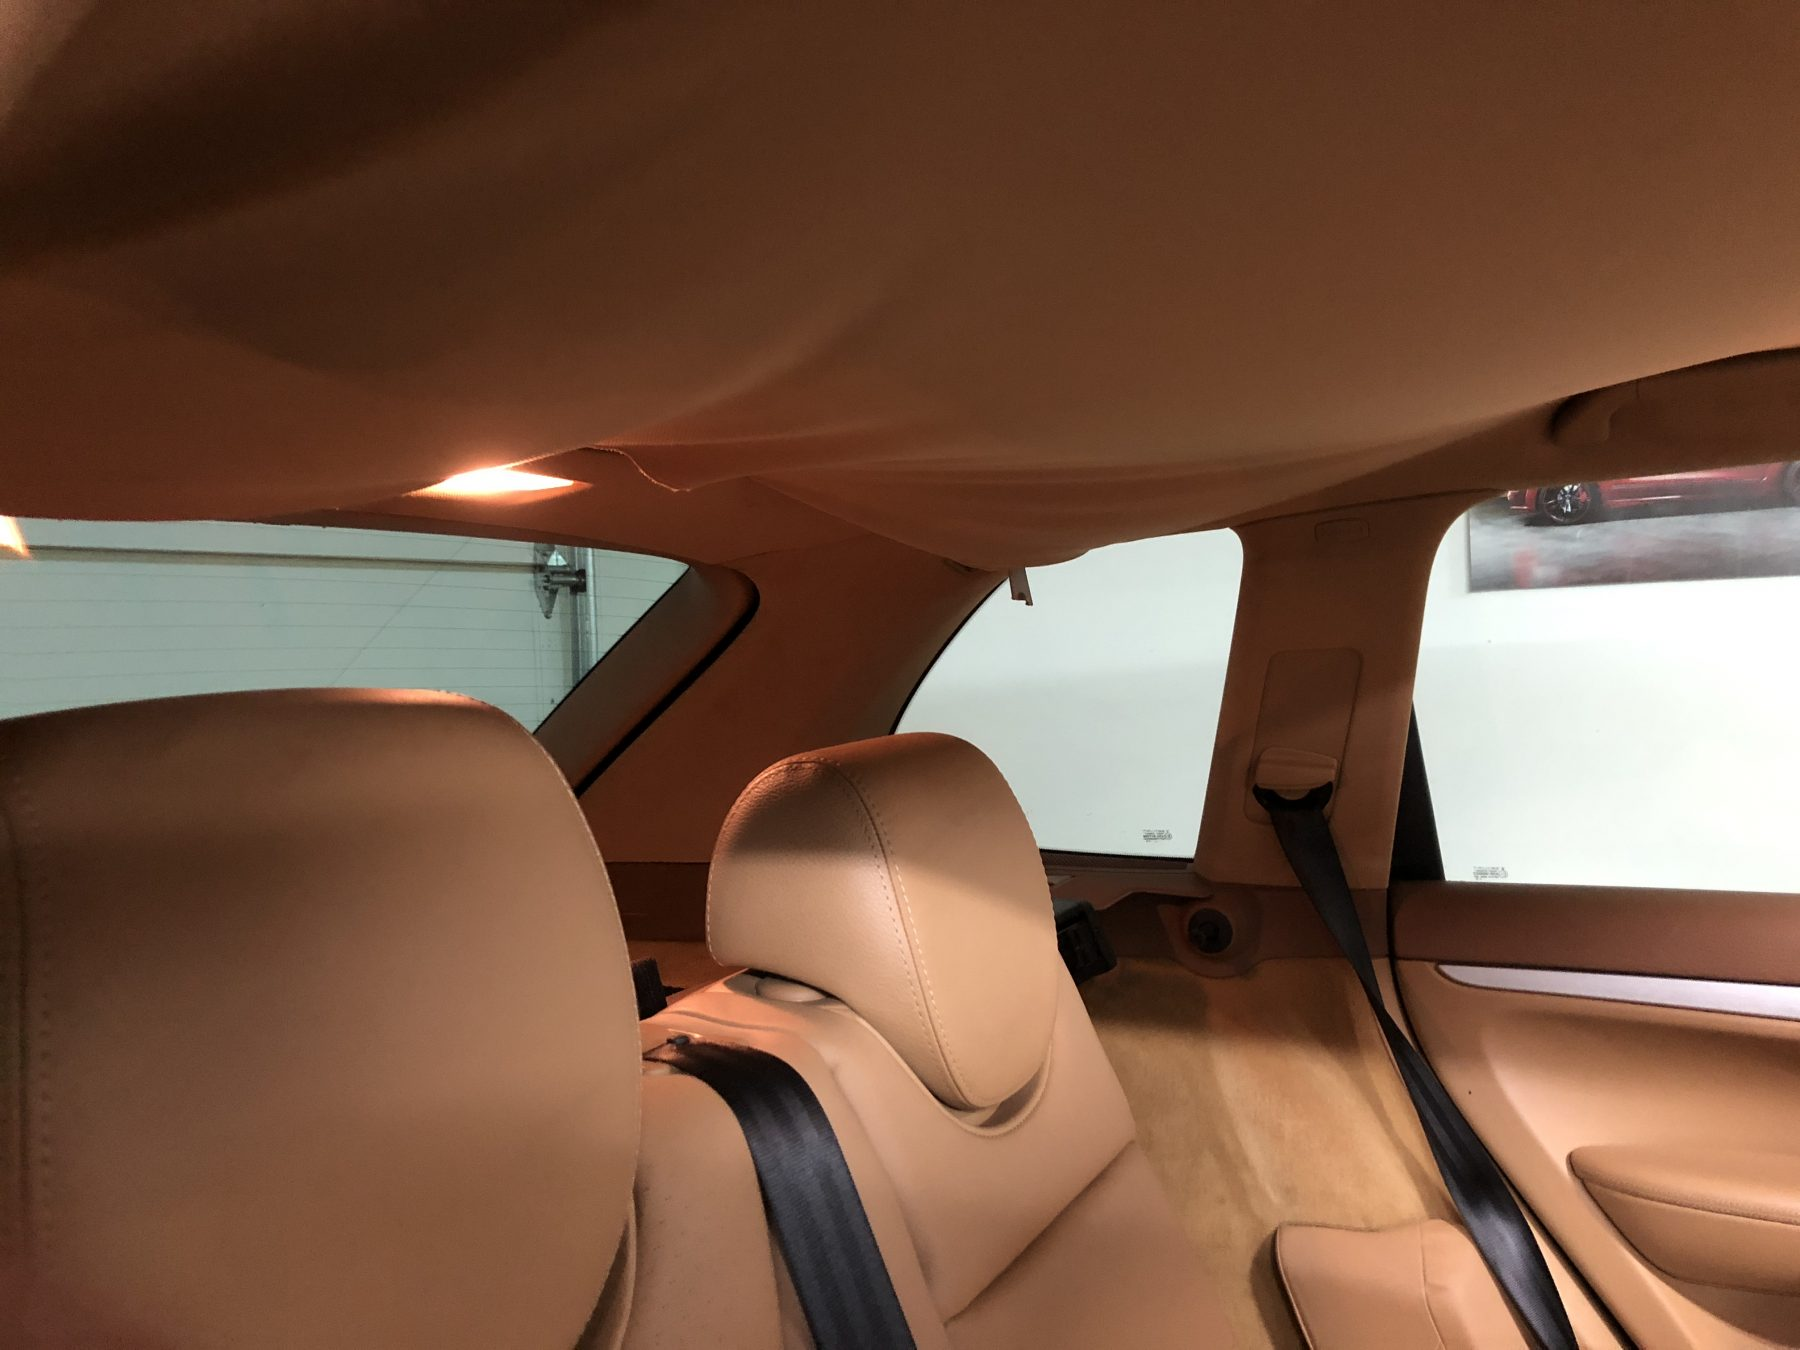 Porsche Cayenne Upholstery